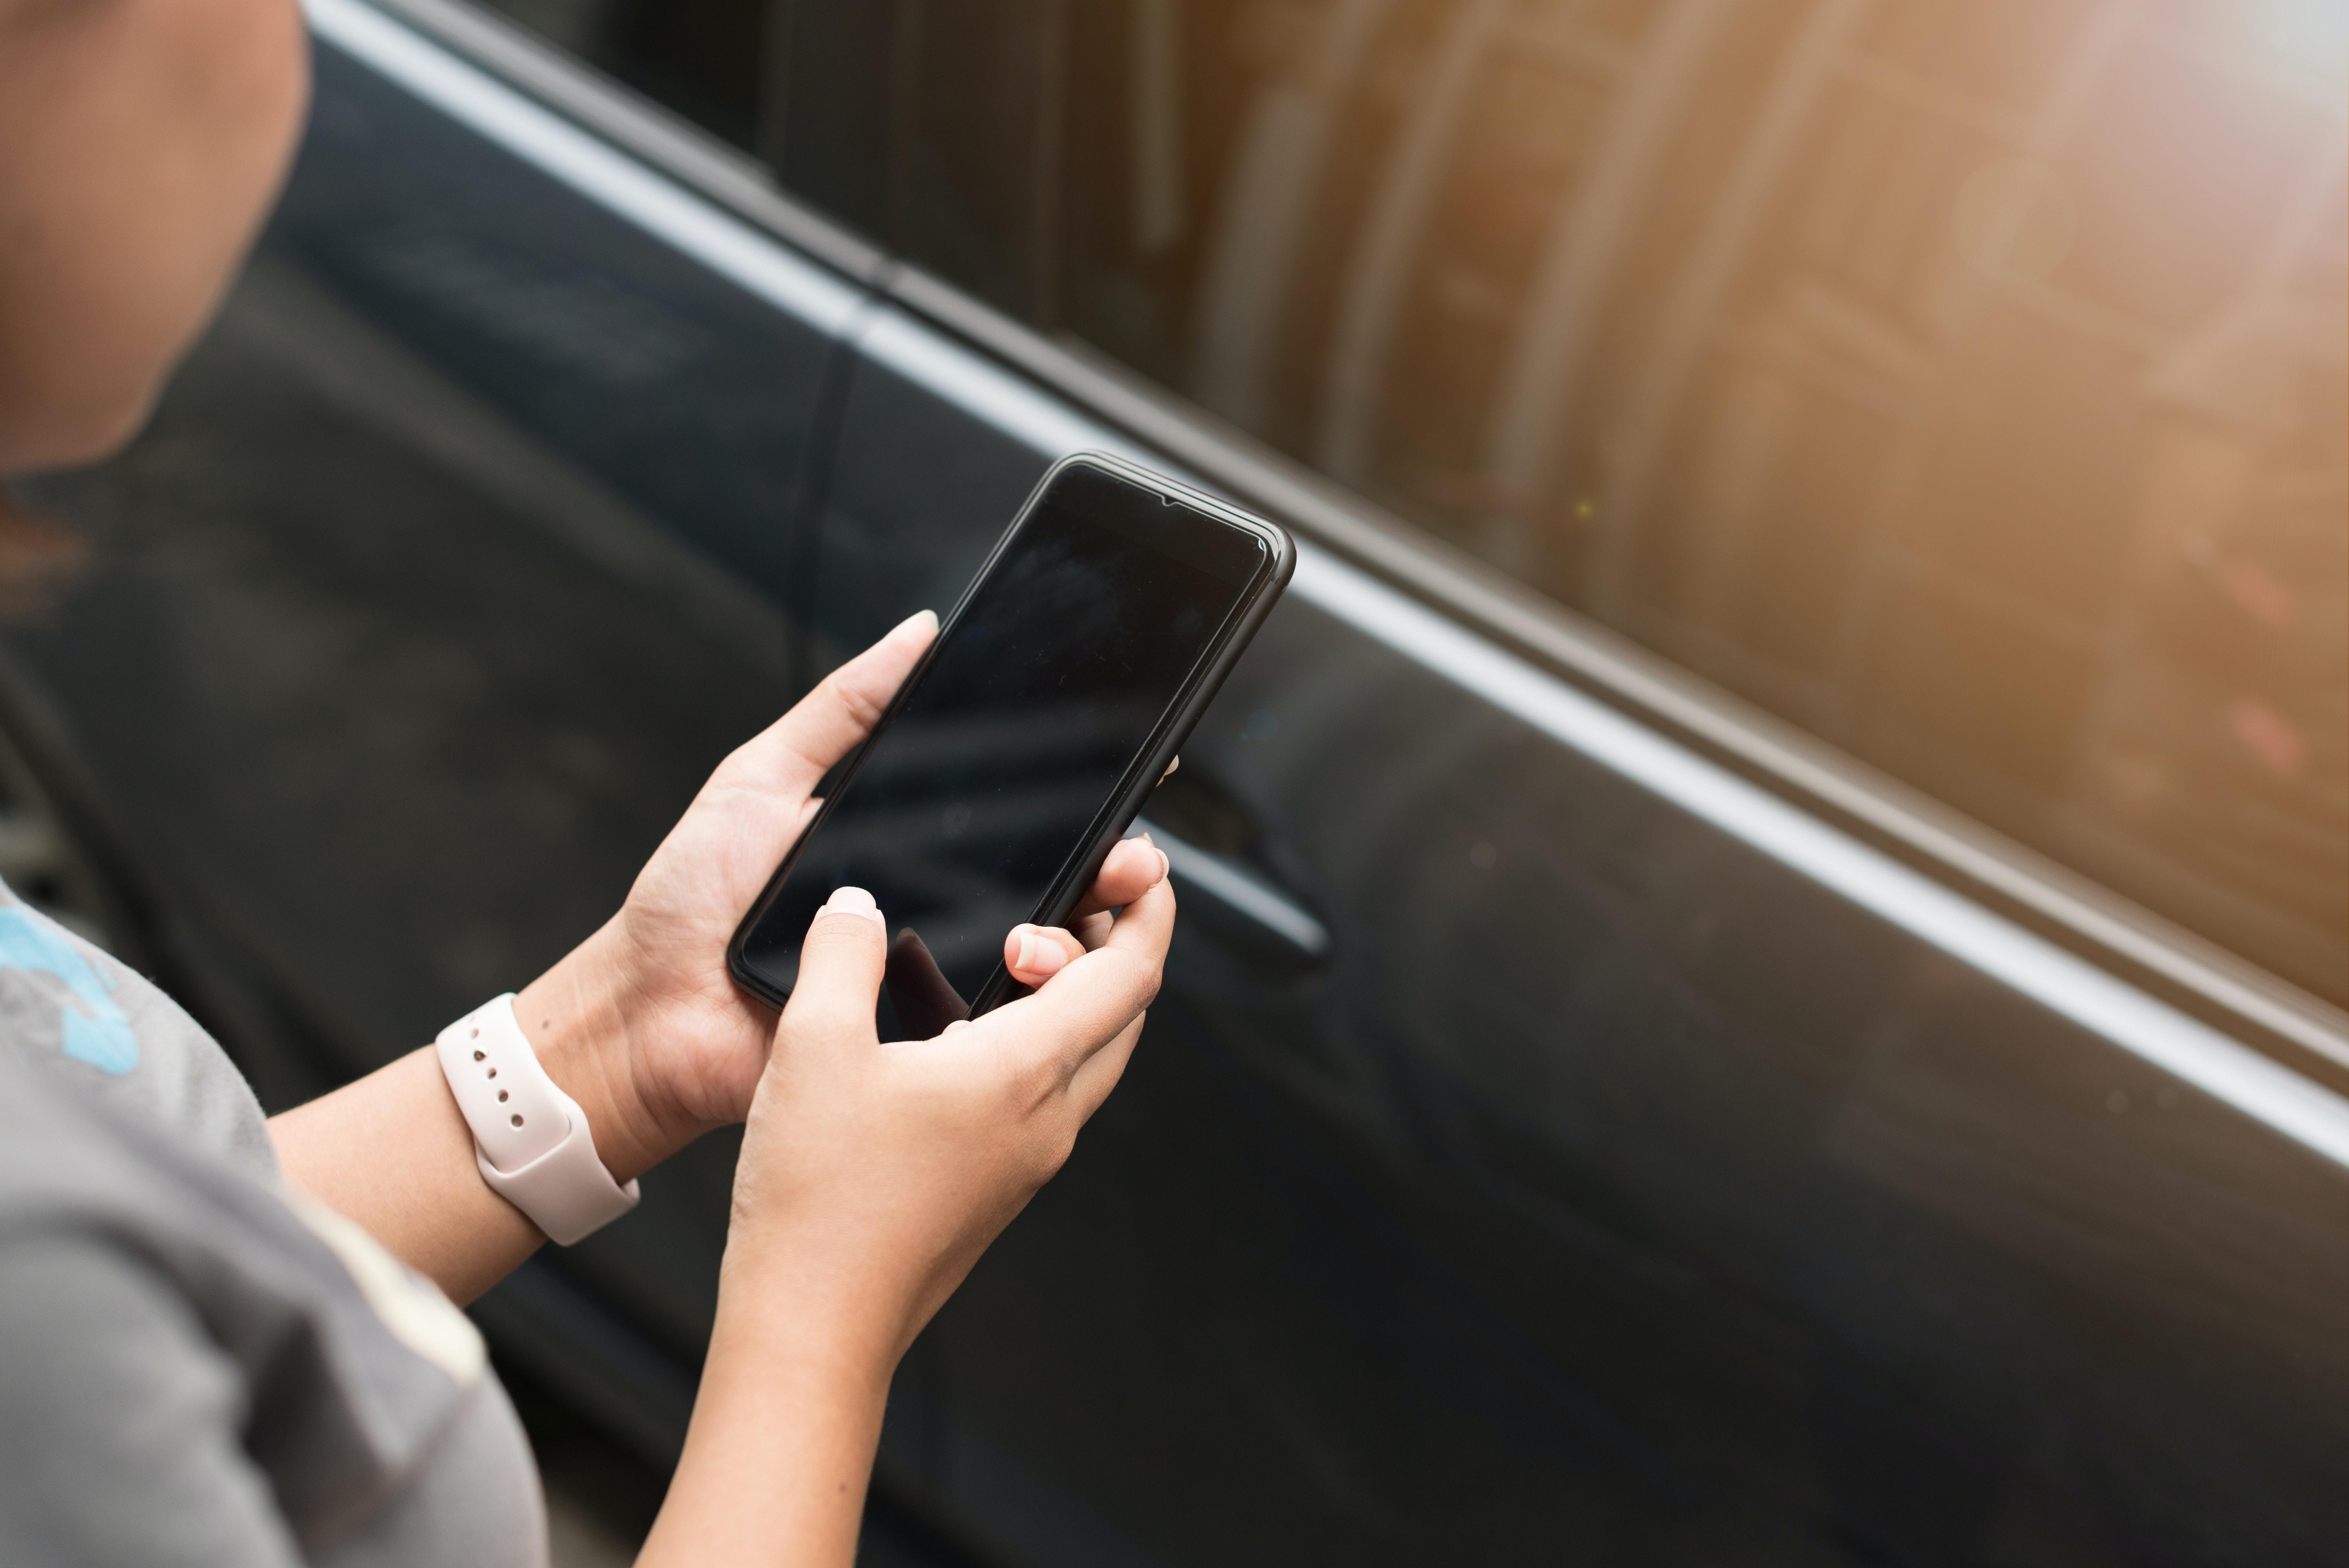 Woman using unlocked phone